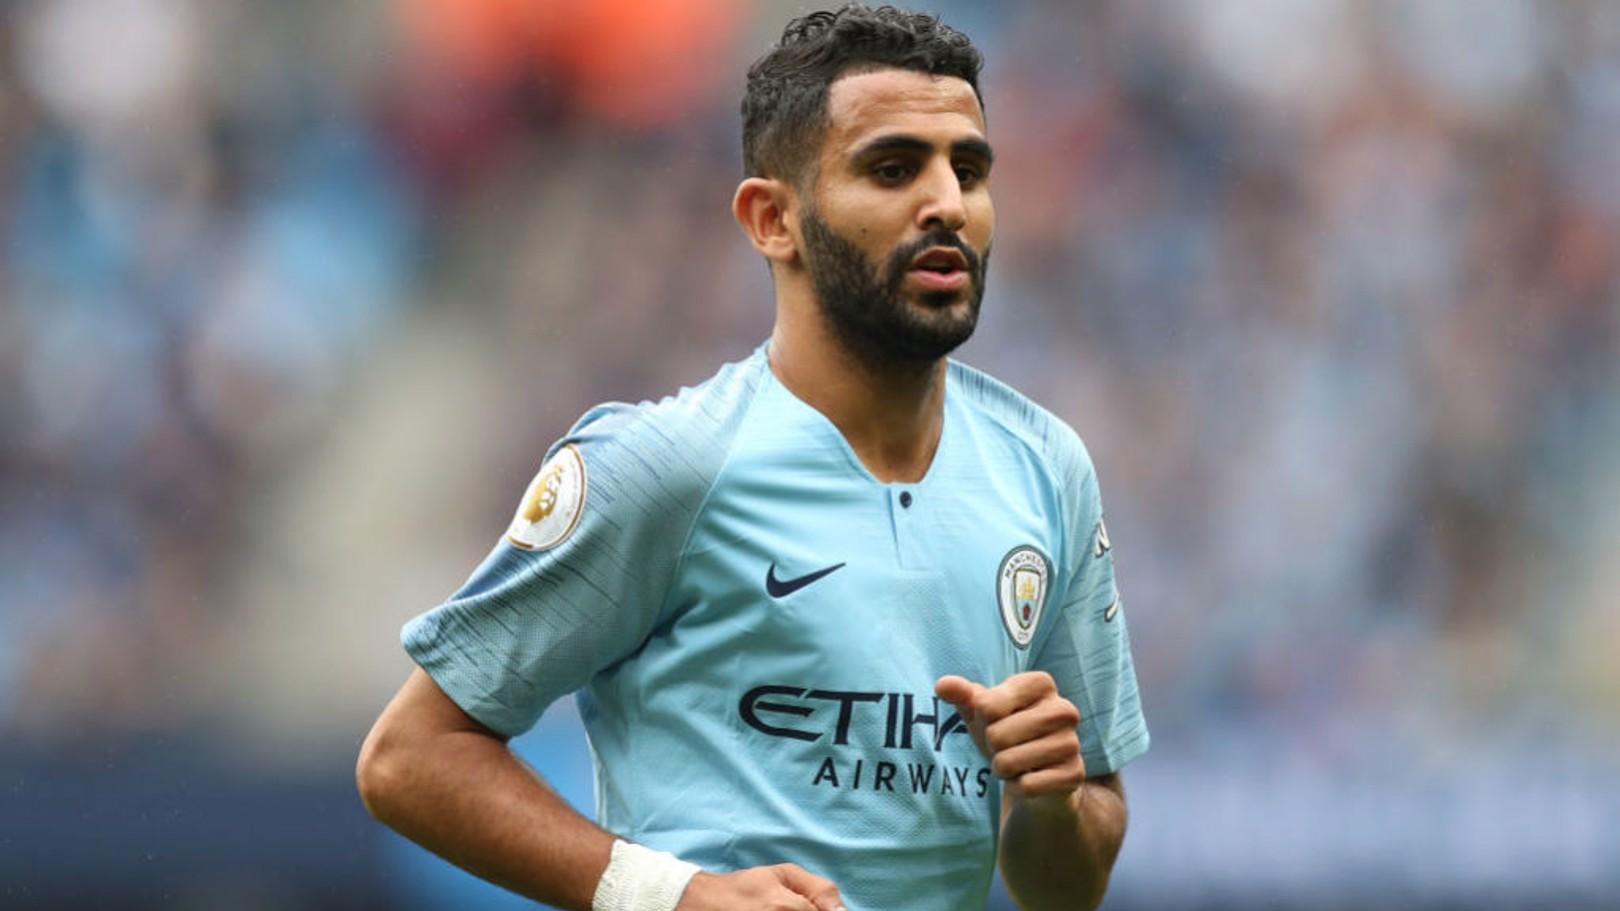 SMOOTH OPERATOR: Pep Guardiola has praised the way Riyad Mahrez has adapted to life at Manchester City